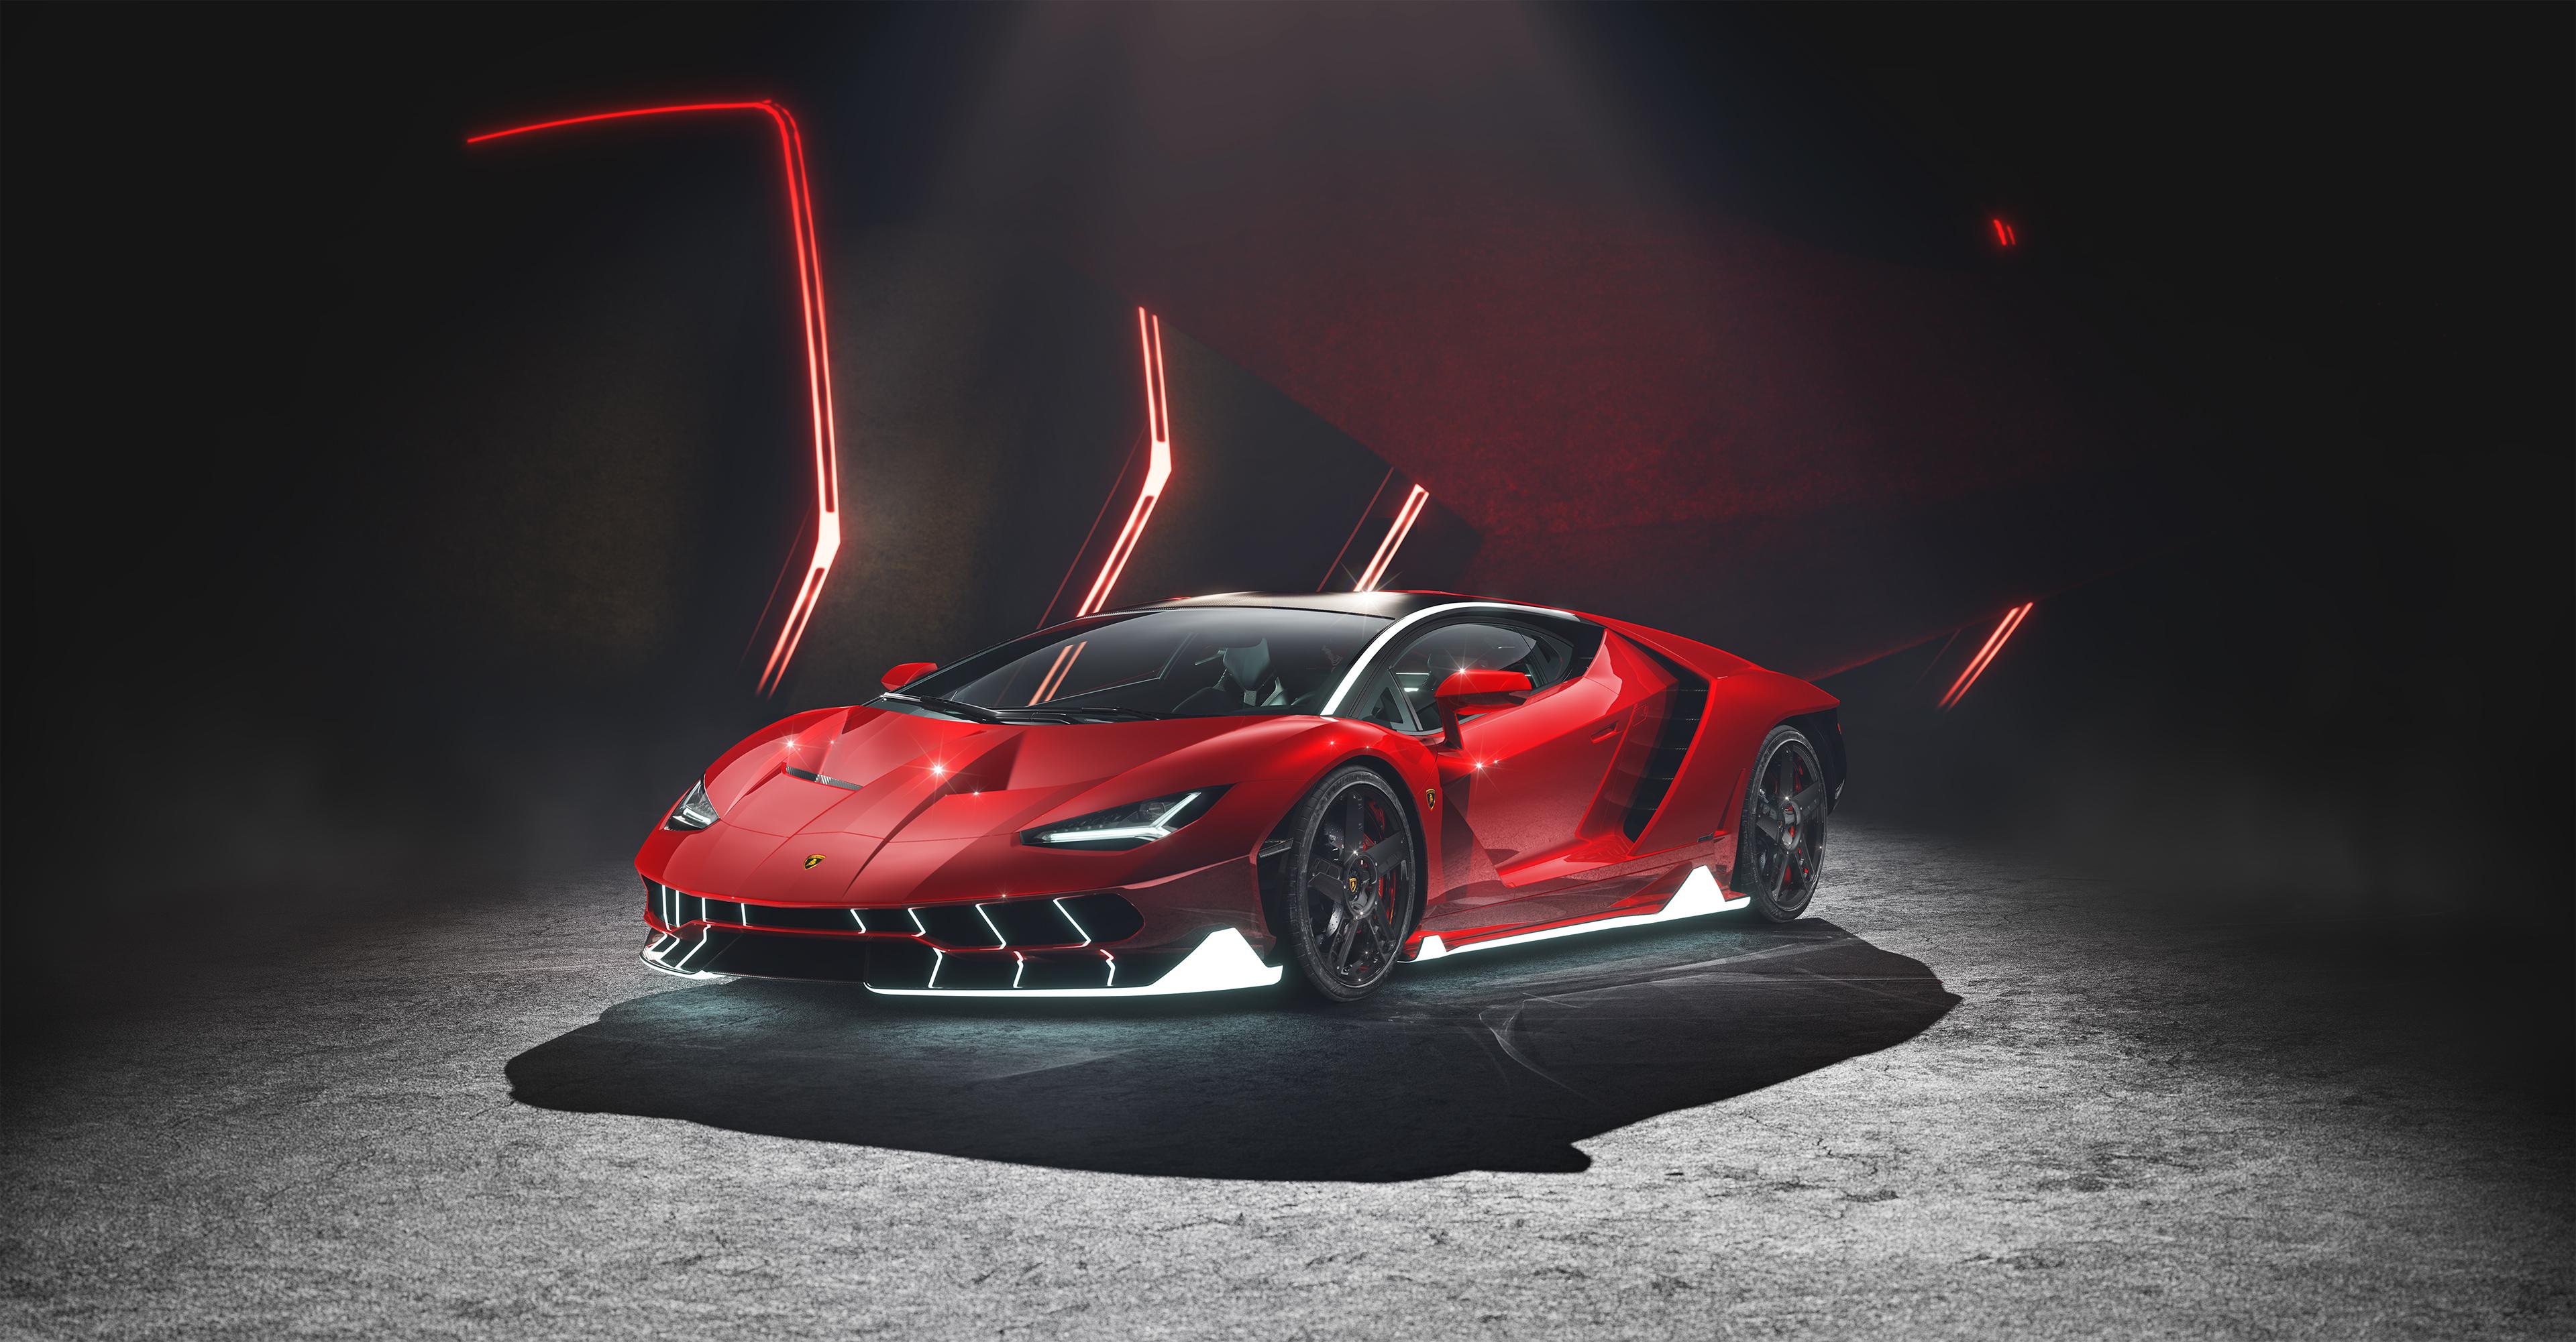 red lamborghini 1577653297 - Red Lamborghini - Red Lamborghini wallpaper 4k, Red Lamborghini 4k wallpaper